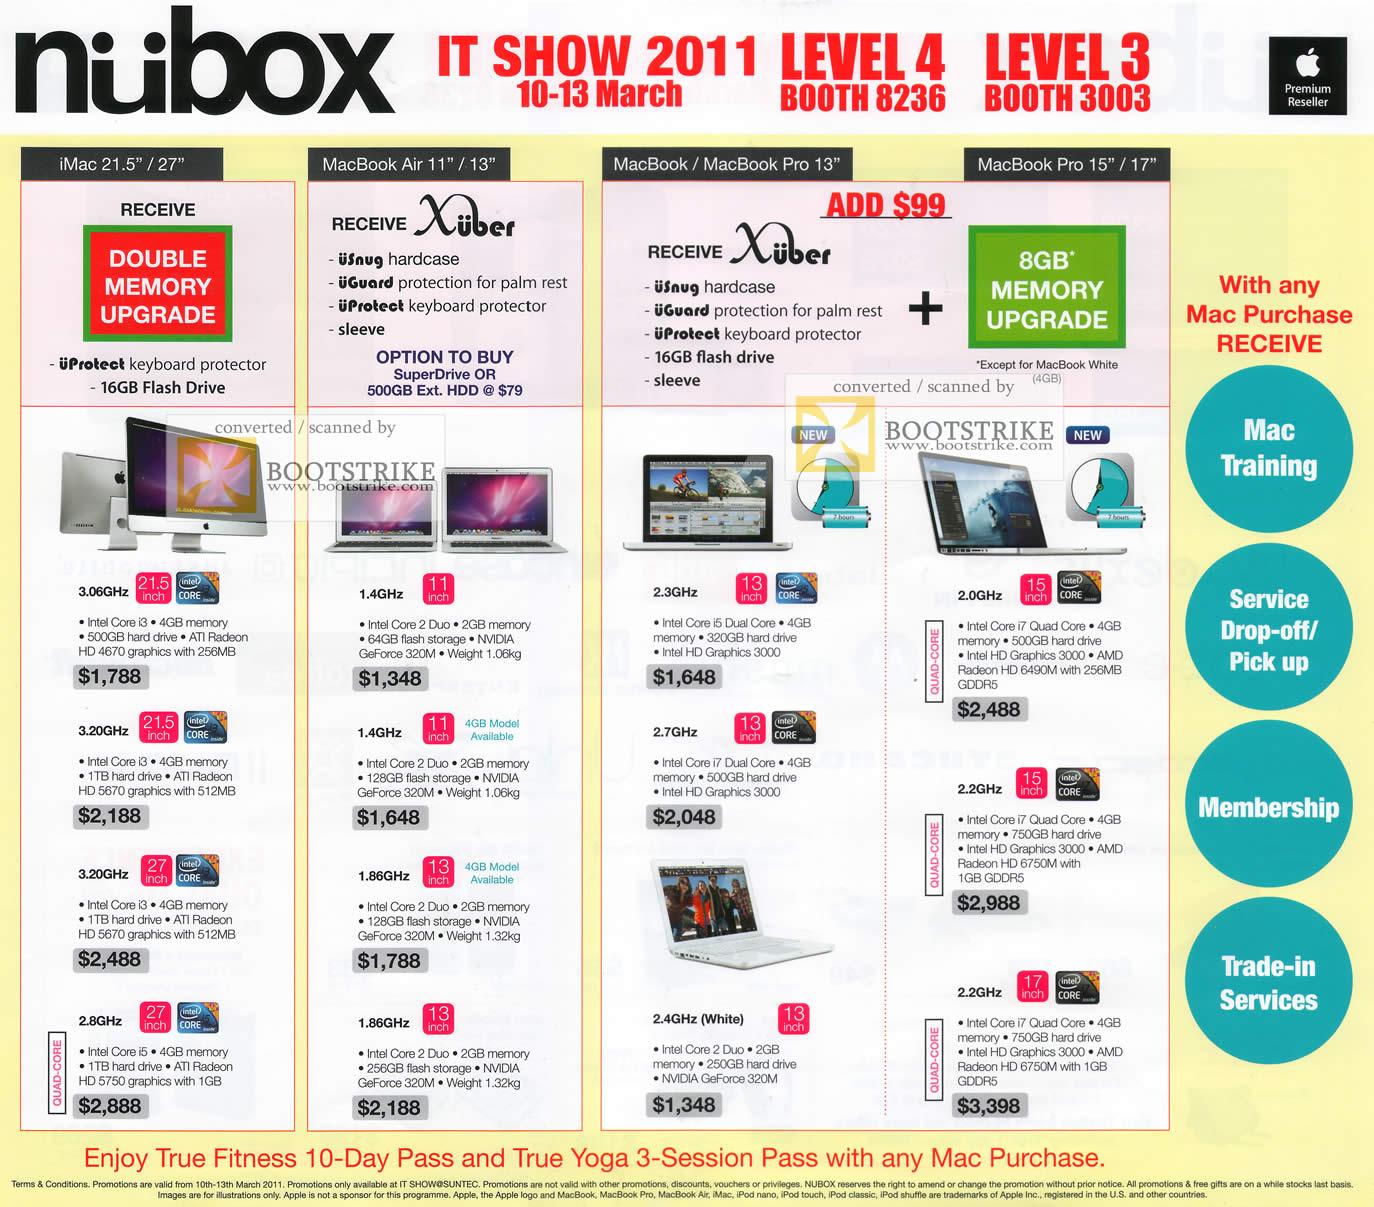 IT Show 2011 price list image brochure of Nubox Apple IMac MacBook Air MacBook Pro Notebooks Desktop PC